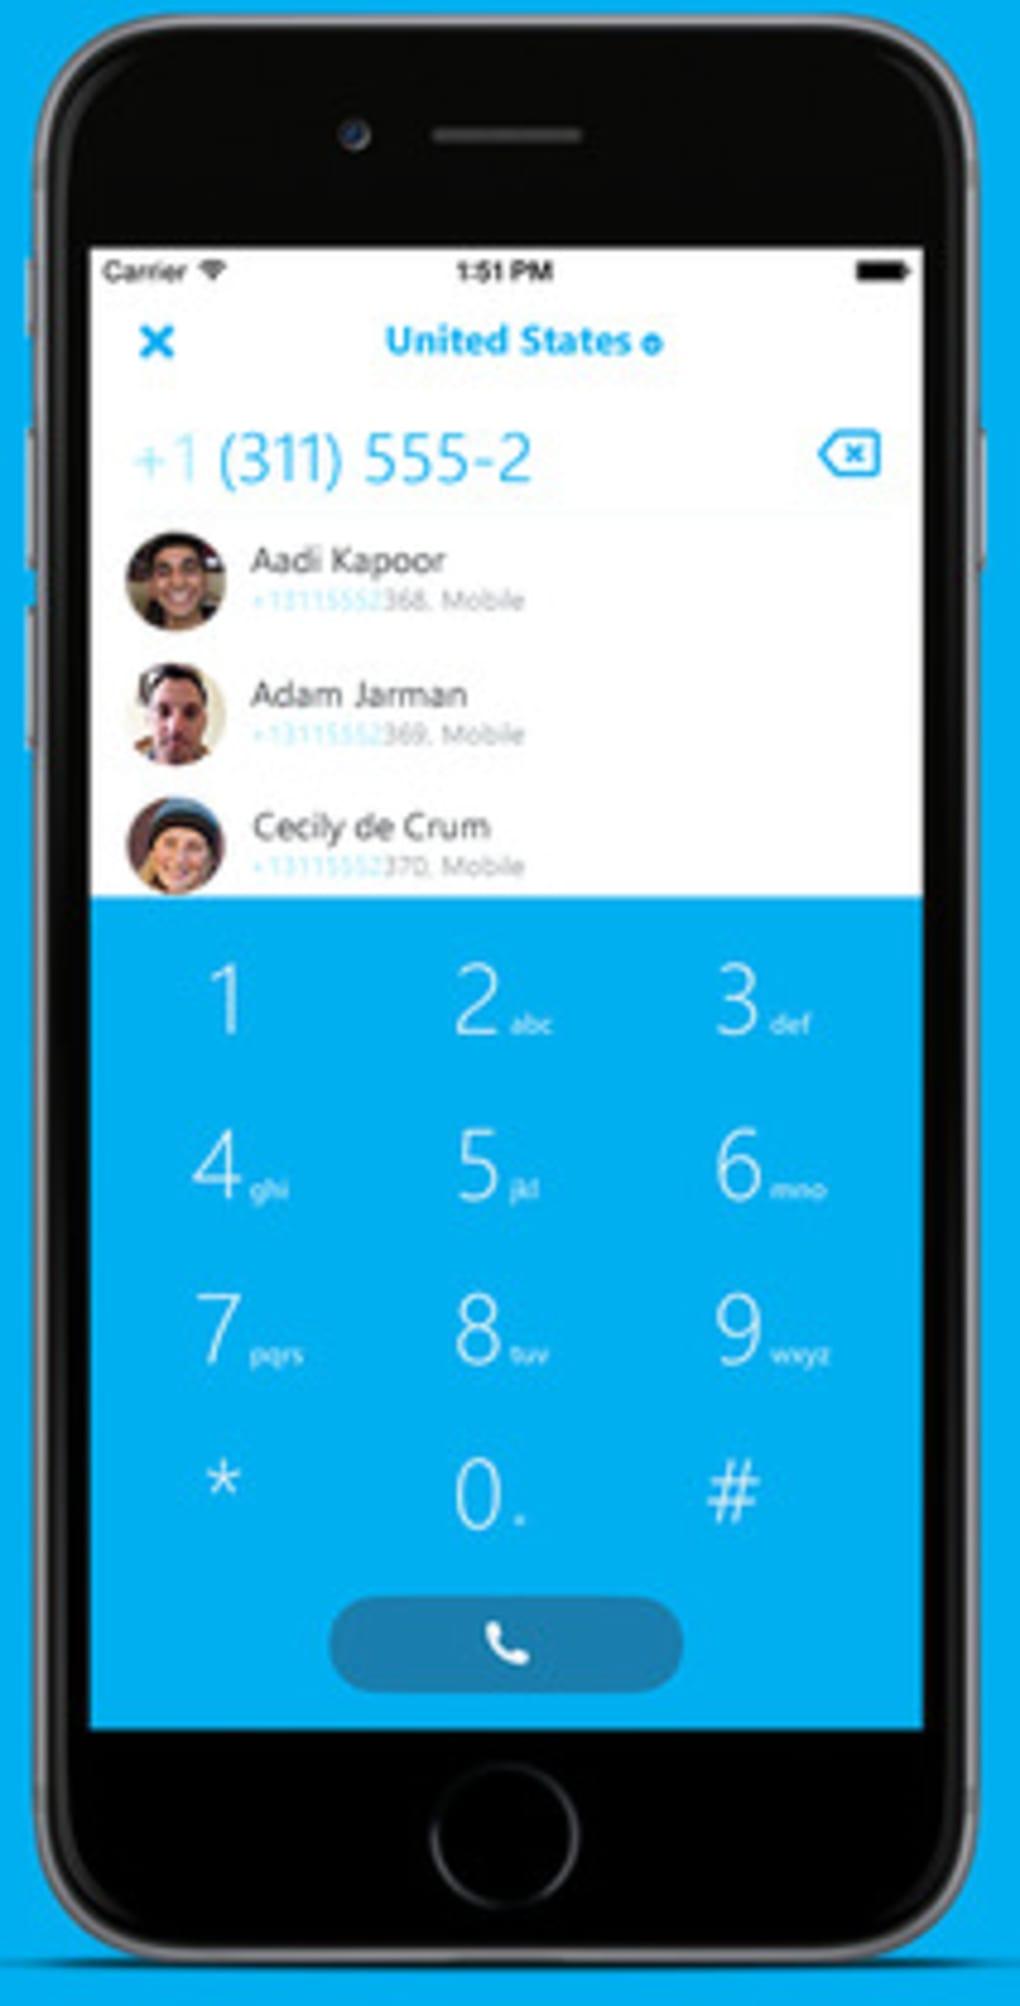 descargar skype gratis para iphone 6 plus